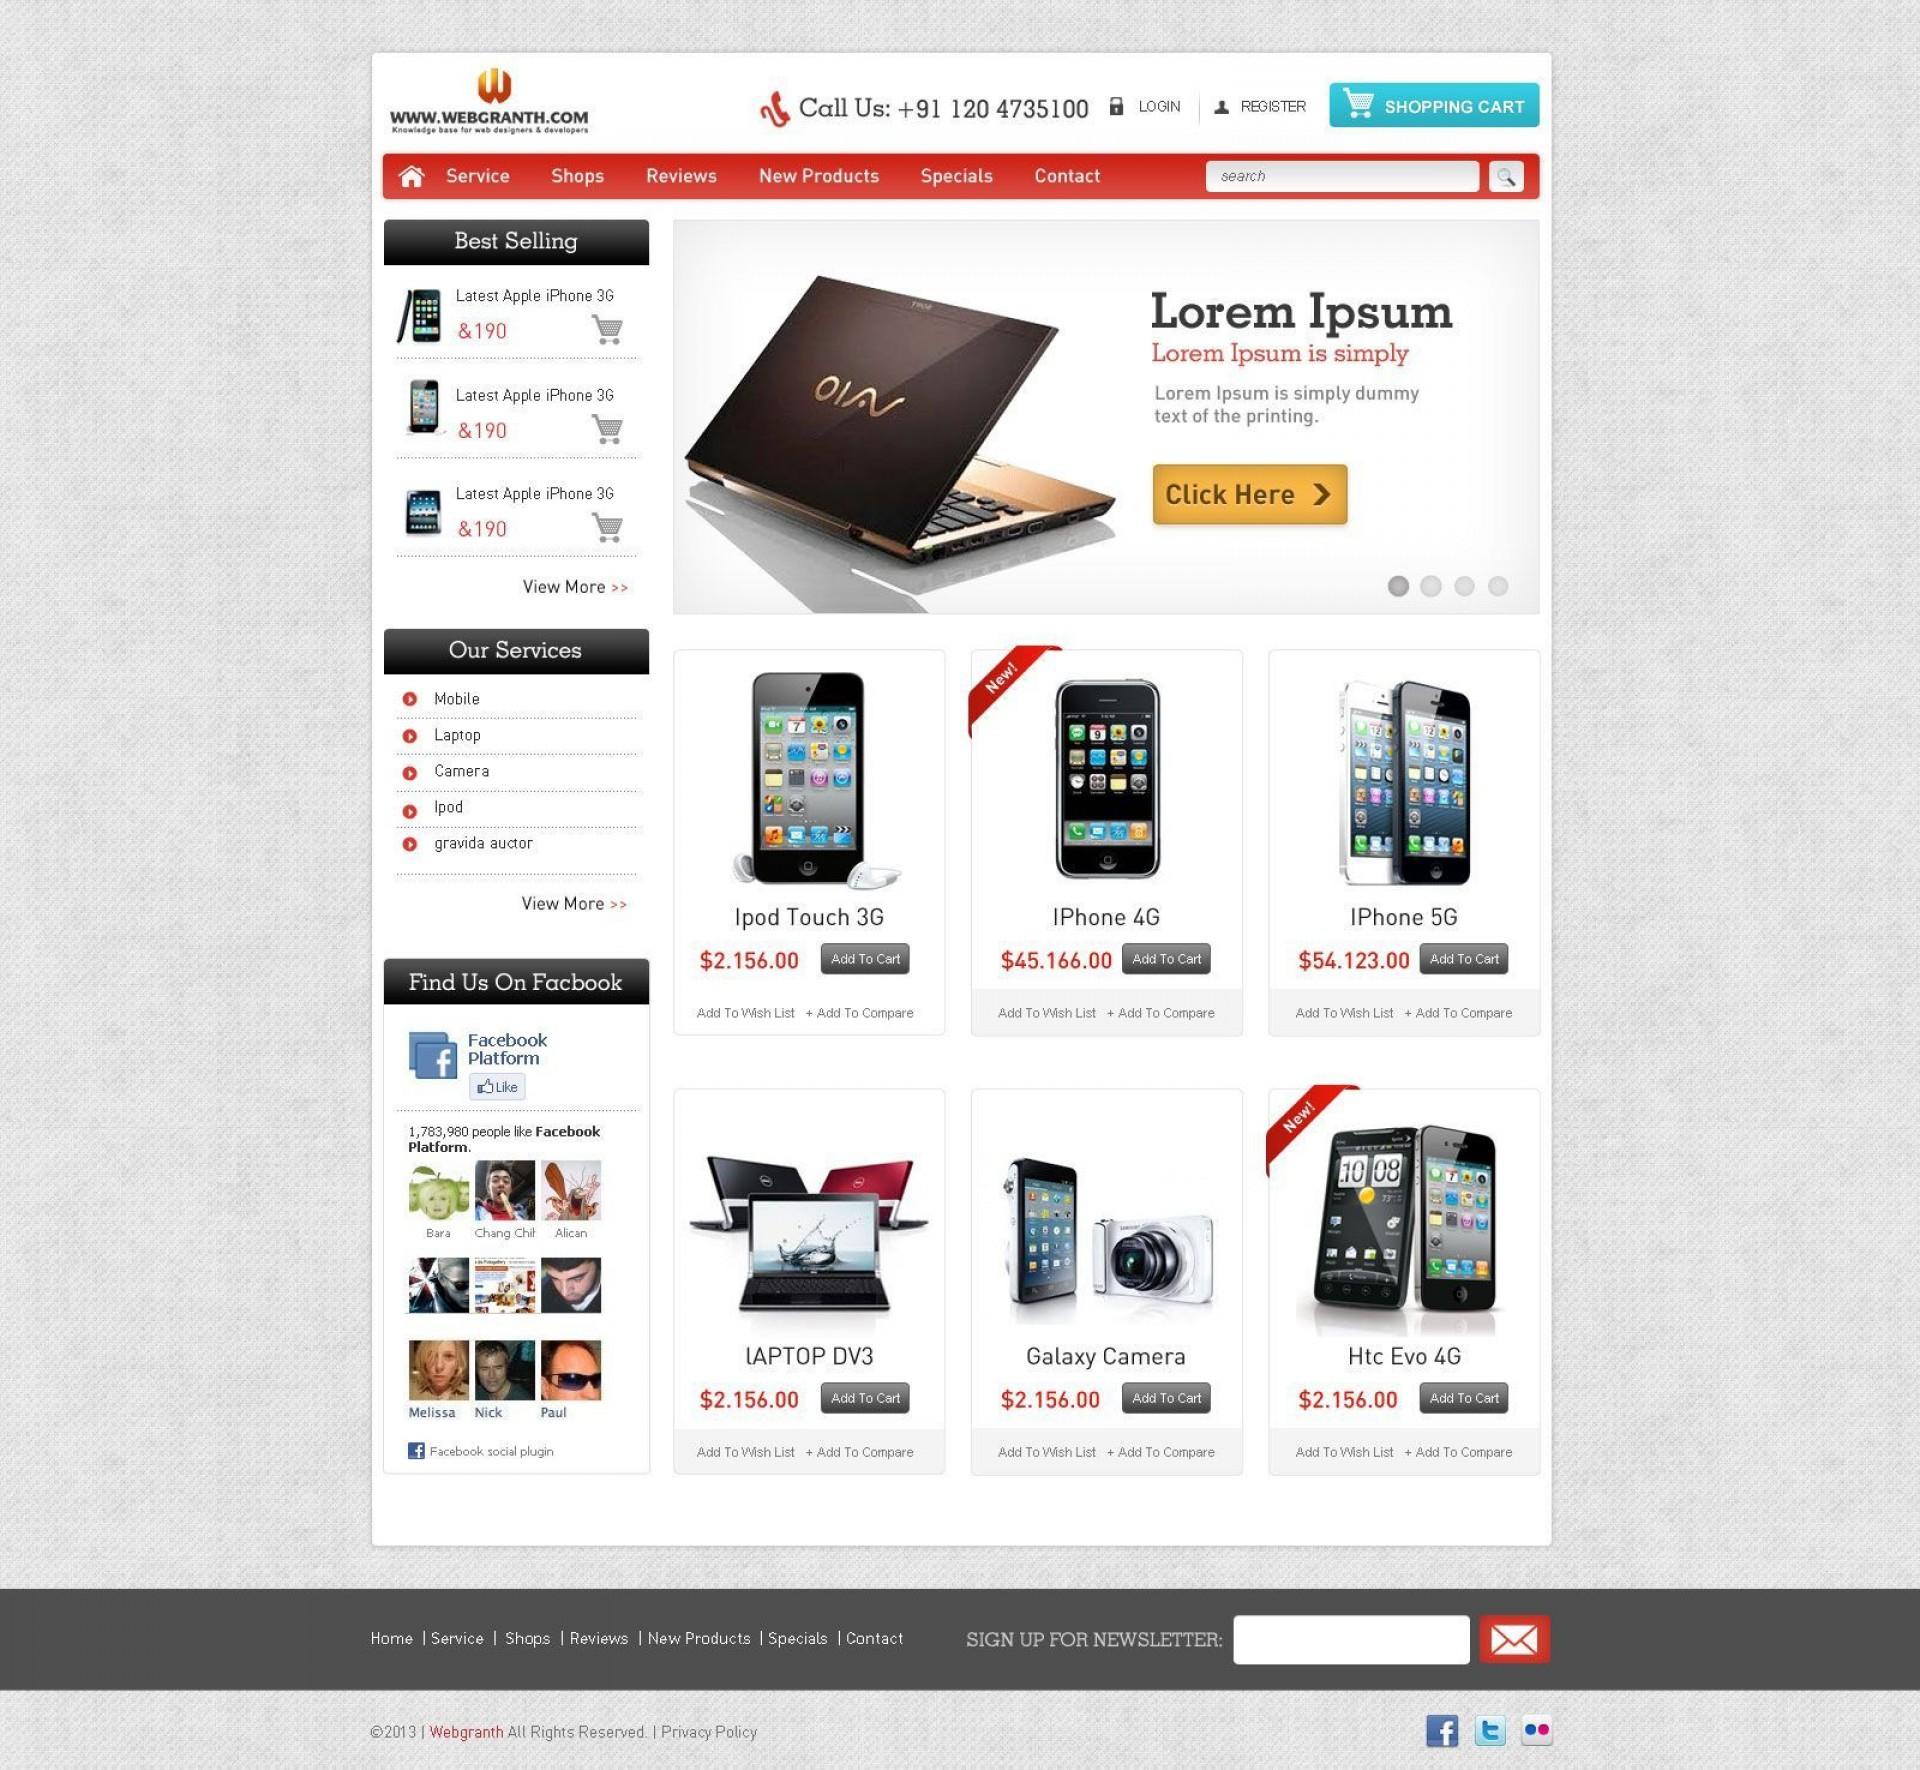 000 Sensational Free E Commerce Website Template High Resolution  Ecommerce Html Cs Bootstrap Php1920